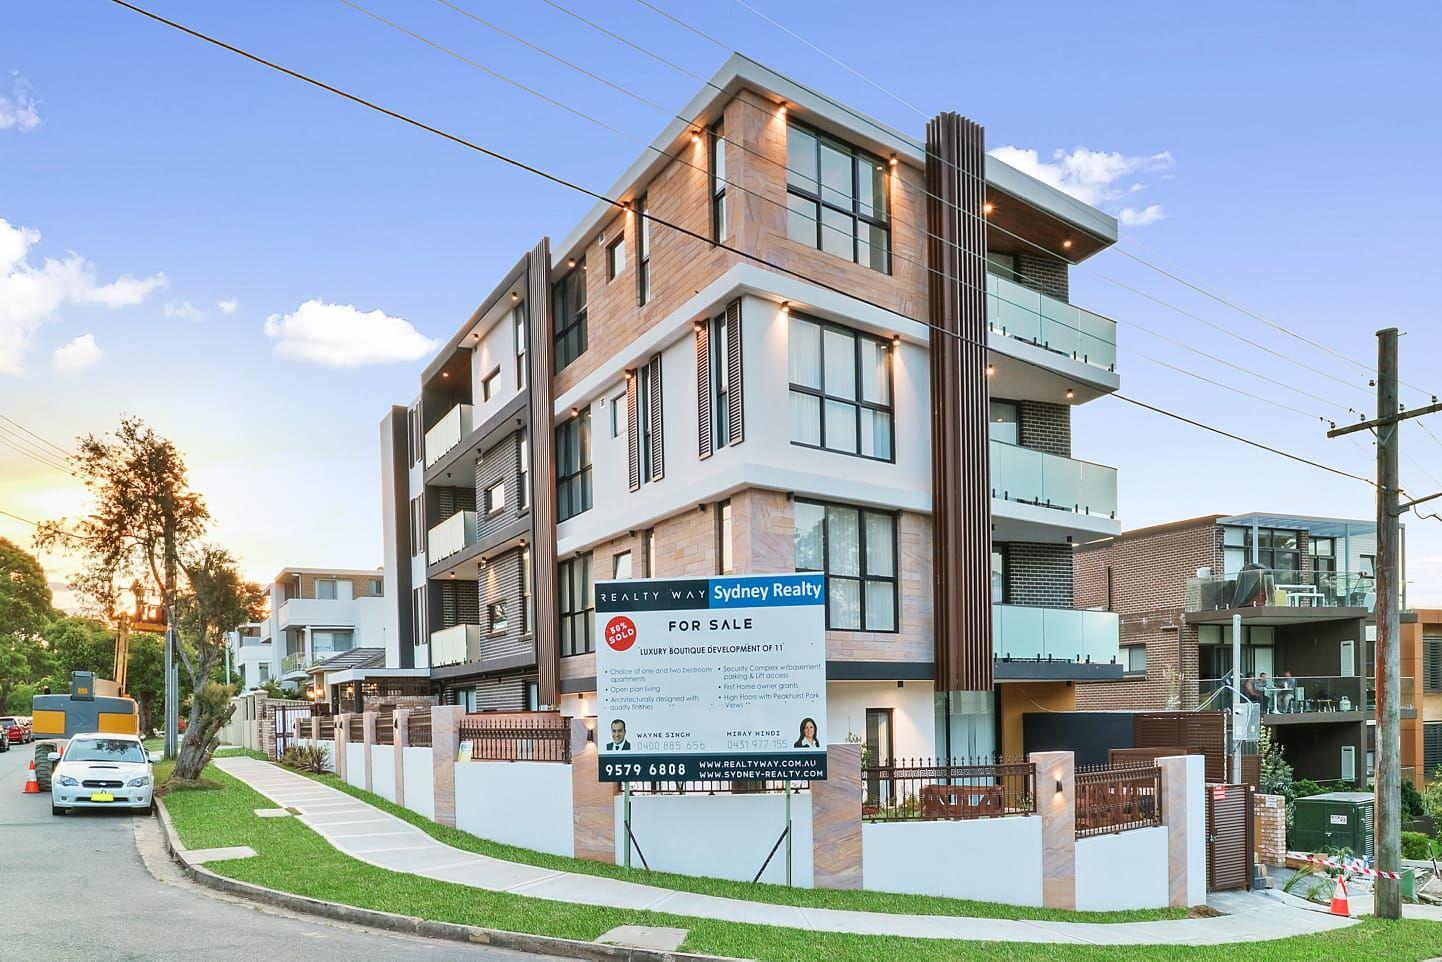 13 Pearce Ave, Peakhurst NSW 2210, Image 0